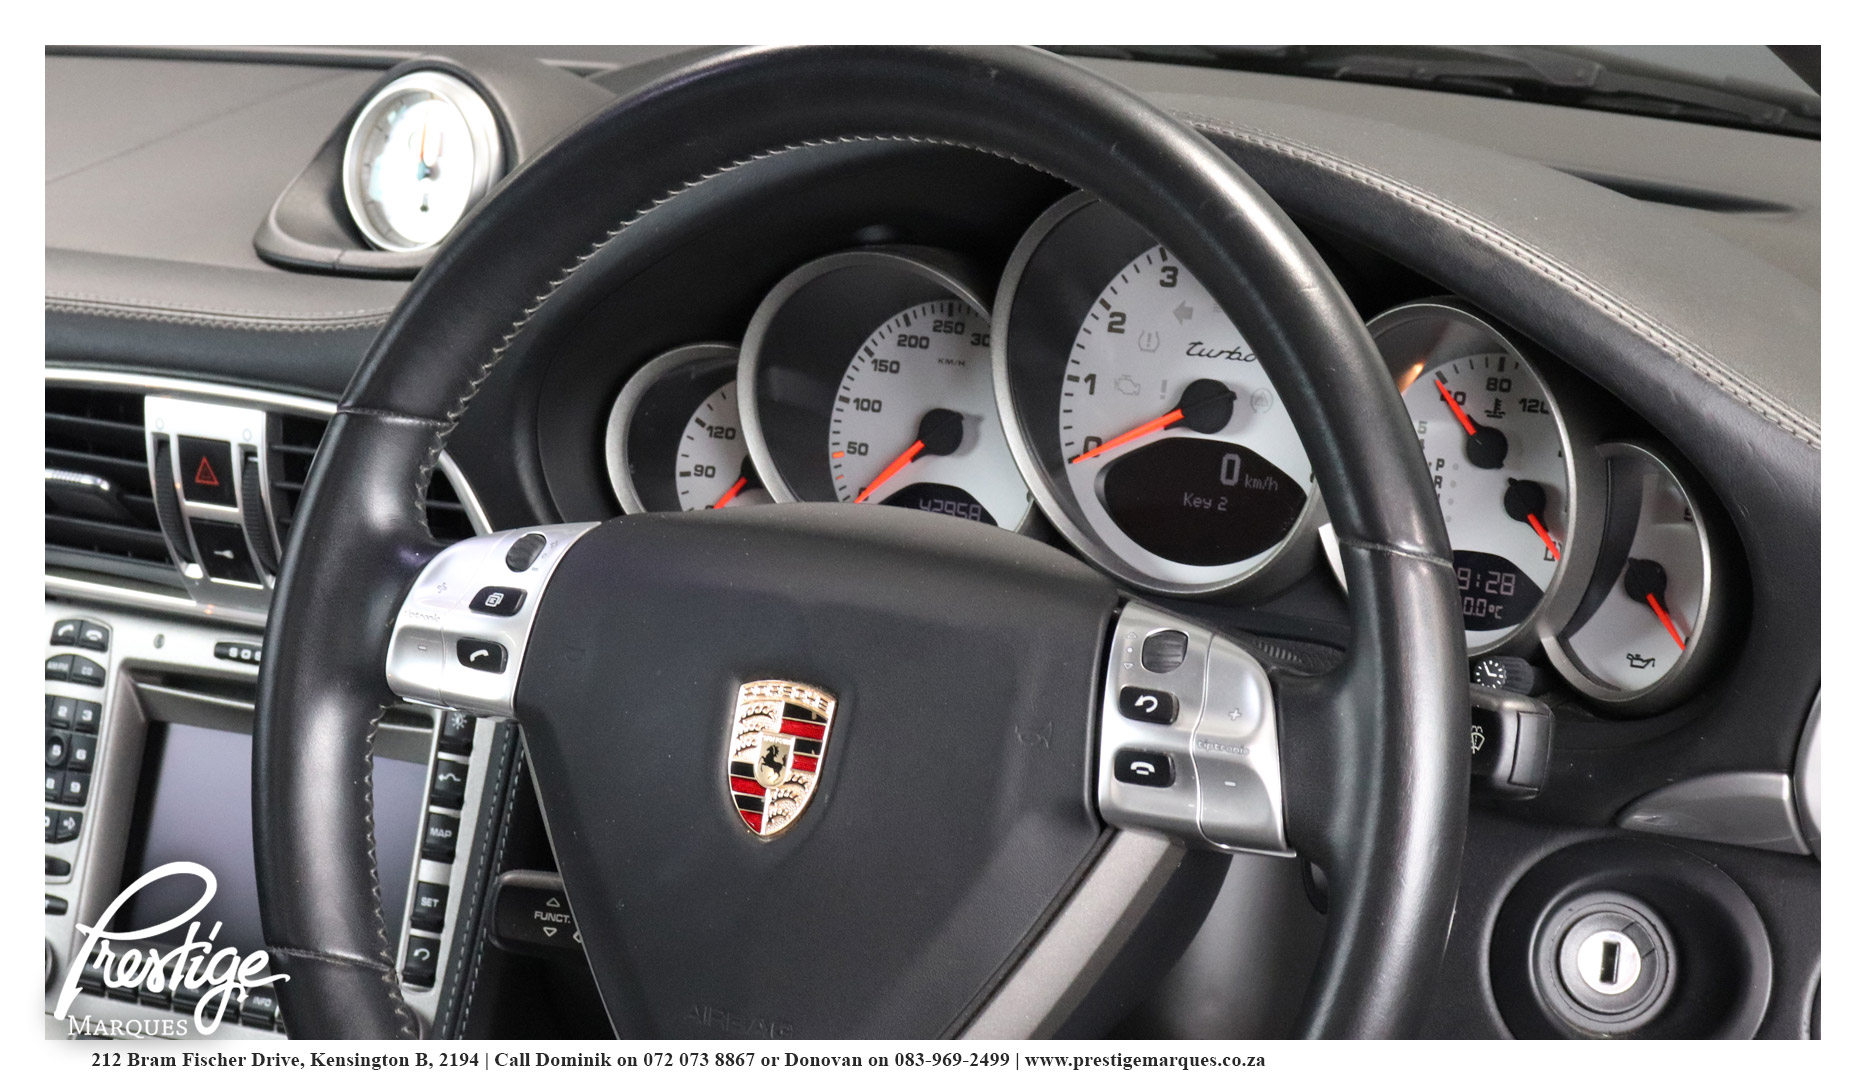 2008-Porsche-911-997-Turbo-Tiptronic-Prestige-Marques-Randburg-Sandton-12